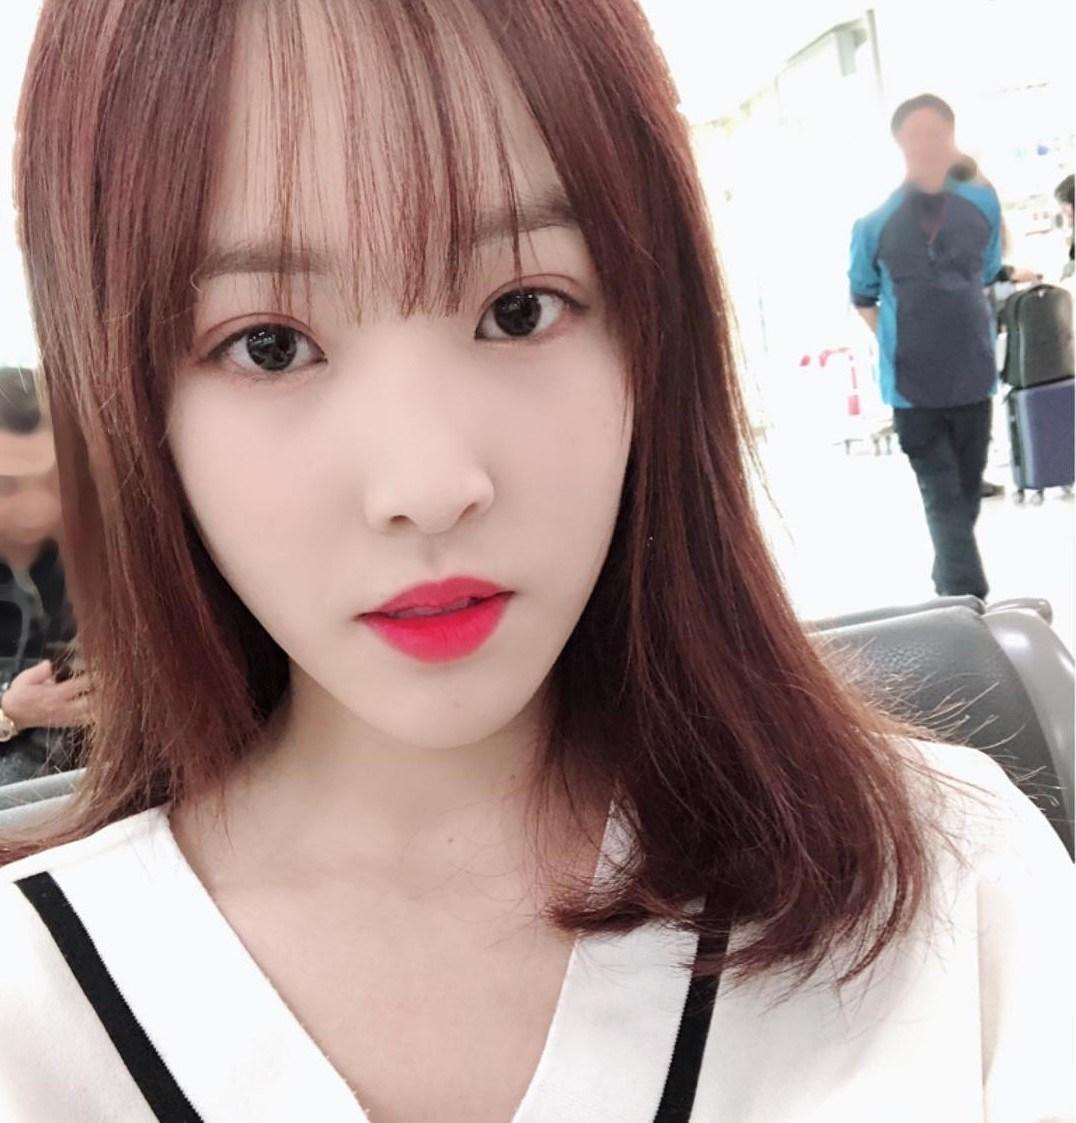 GFRIEND主唱Yuju從11月起就沒有參與組合的官方行程,舞台演出也都由另外五名成員消化。除此之外,在GFRIEND的官方IG上,Yuju的貼文也停留在上個月8號。